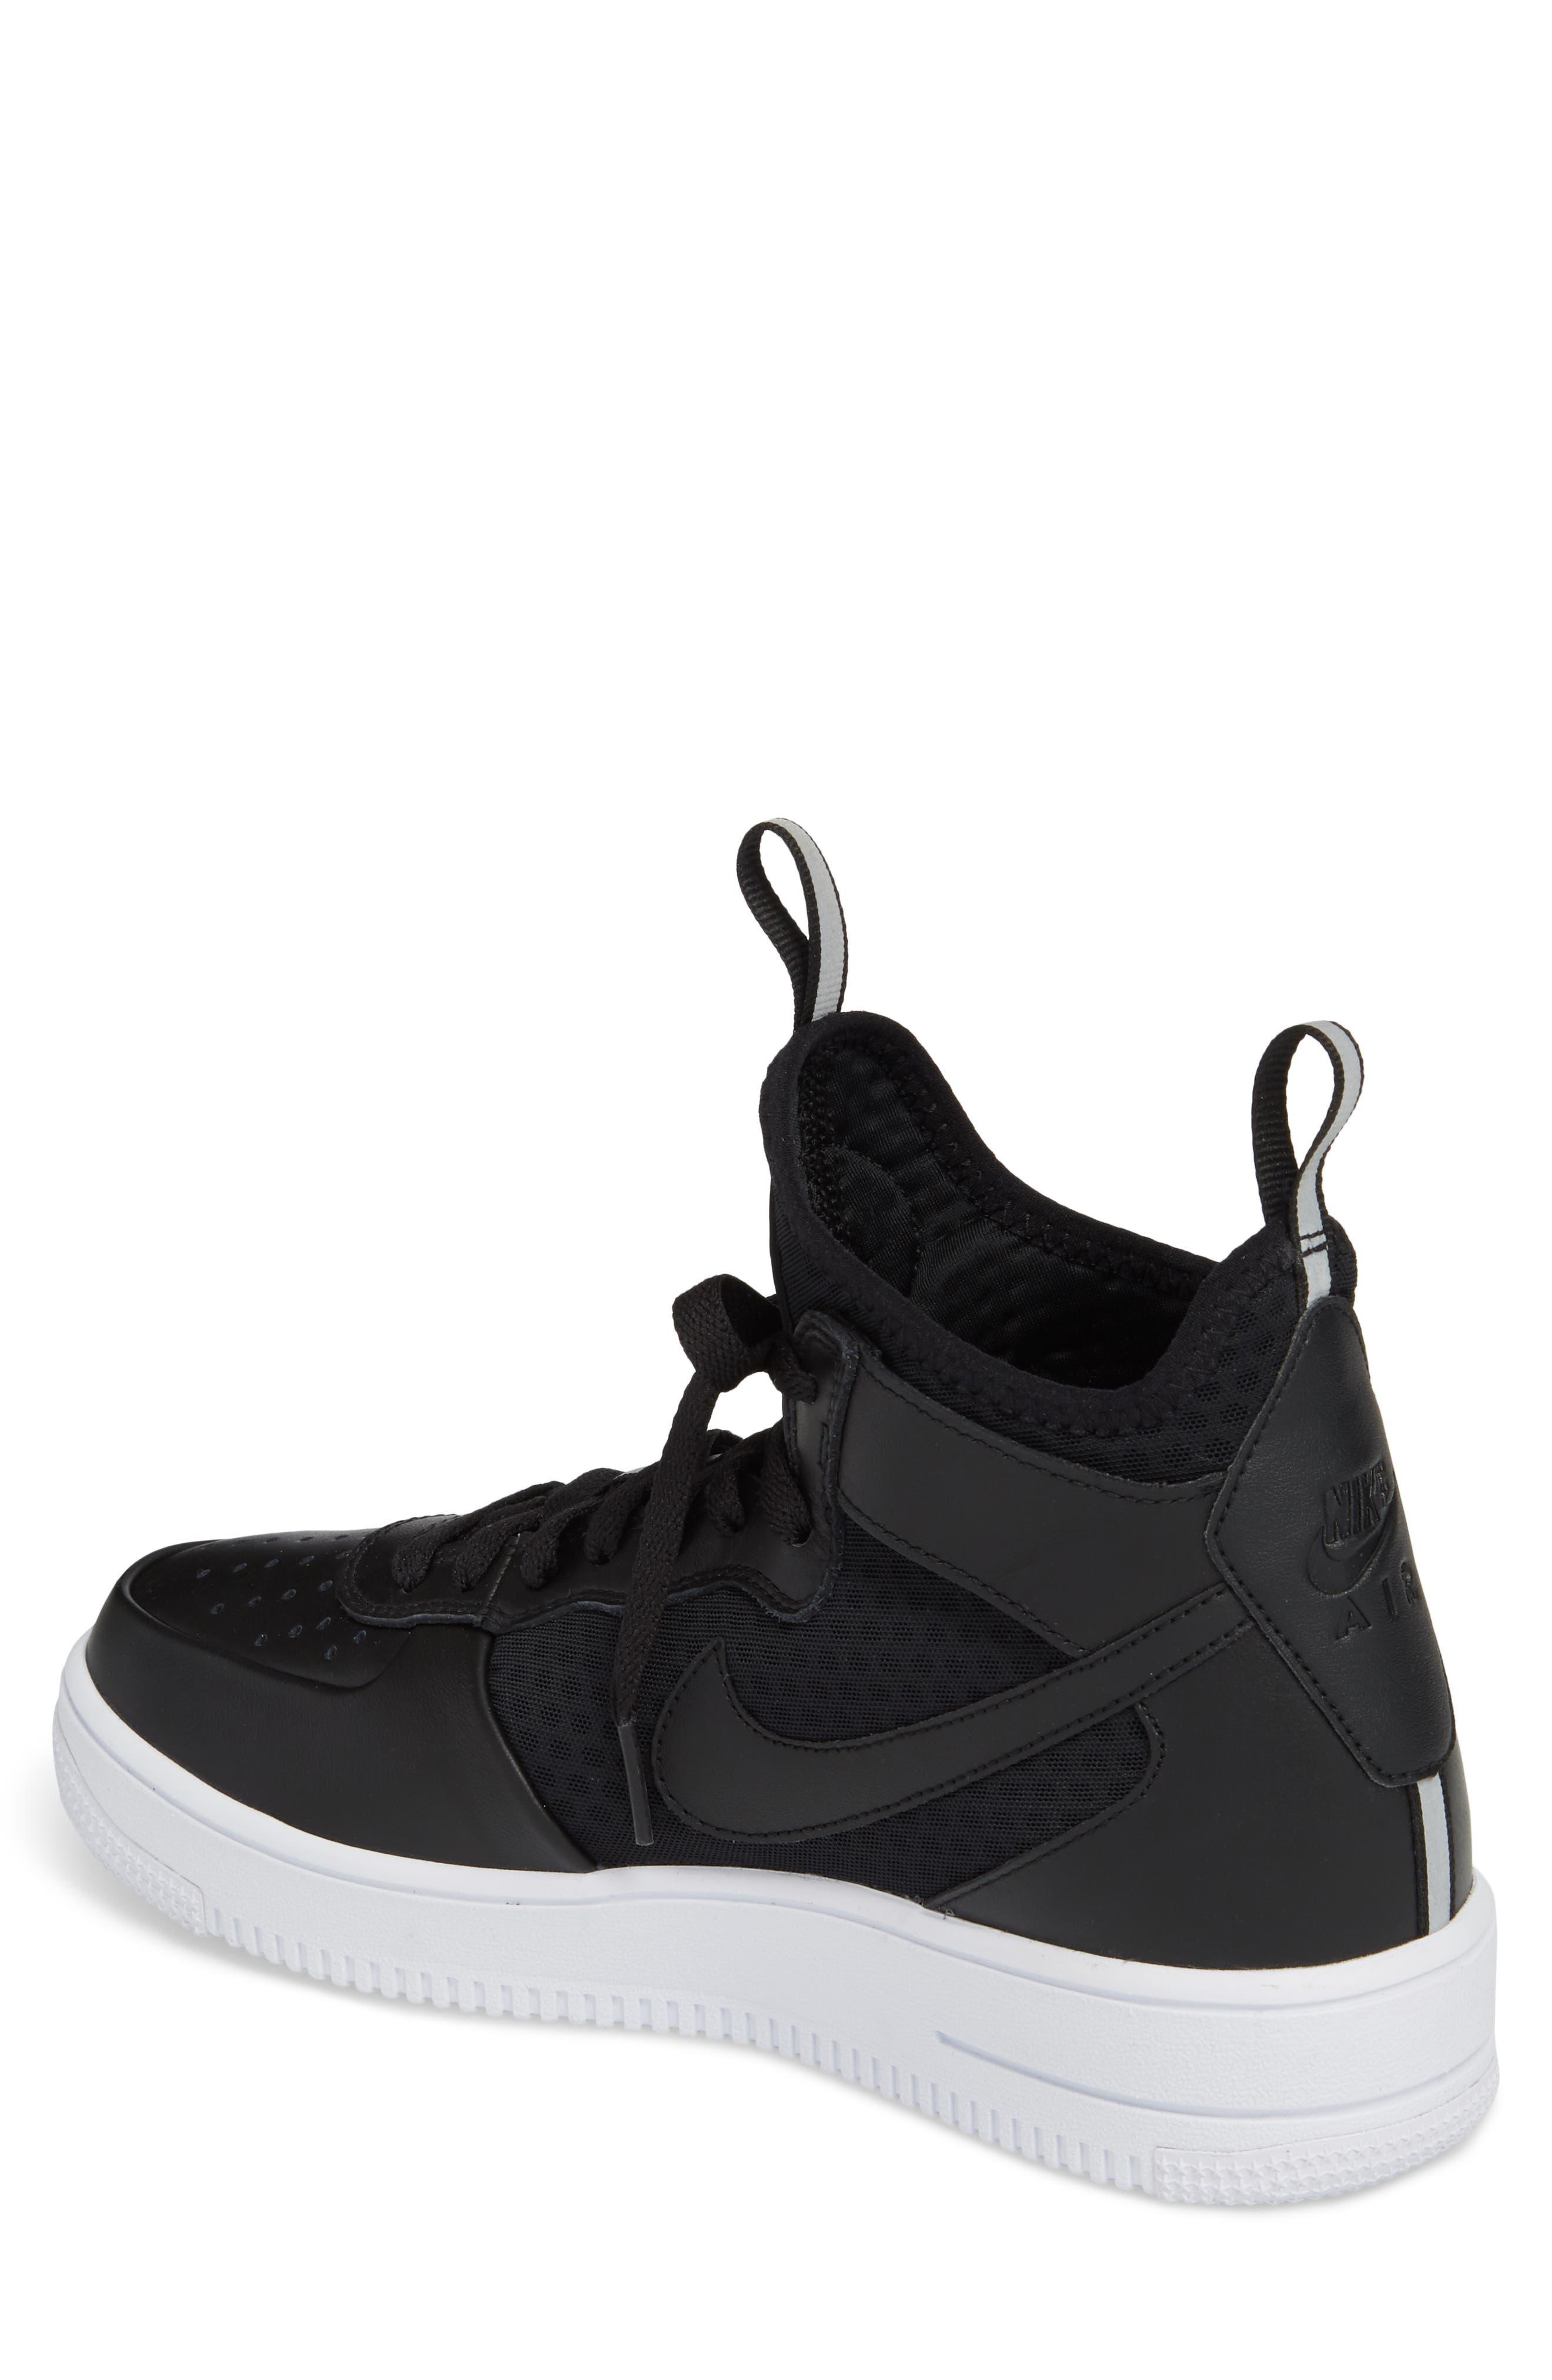 Air Force 1 Ultraforce Mid Sneaker,                             Alternate thumbnail 2, color,                             001